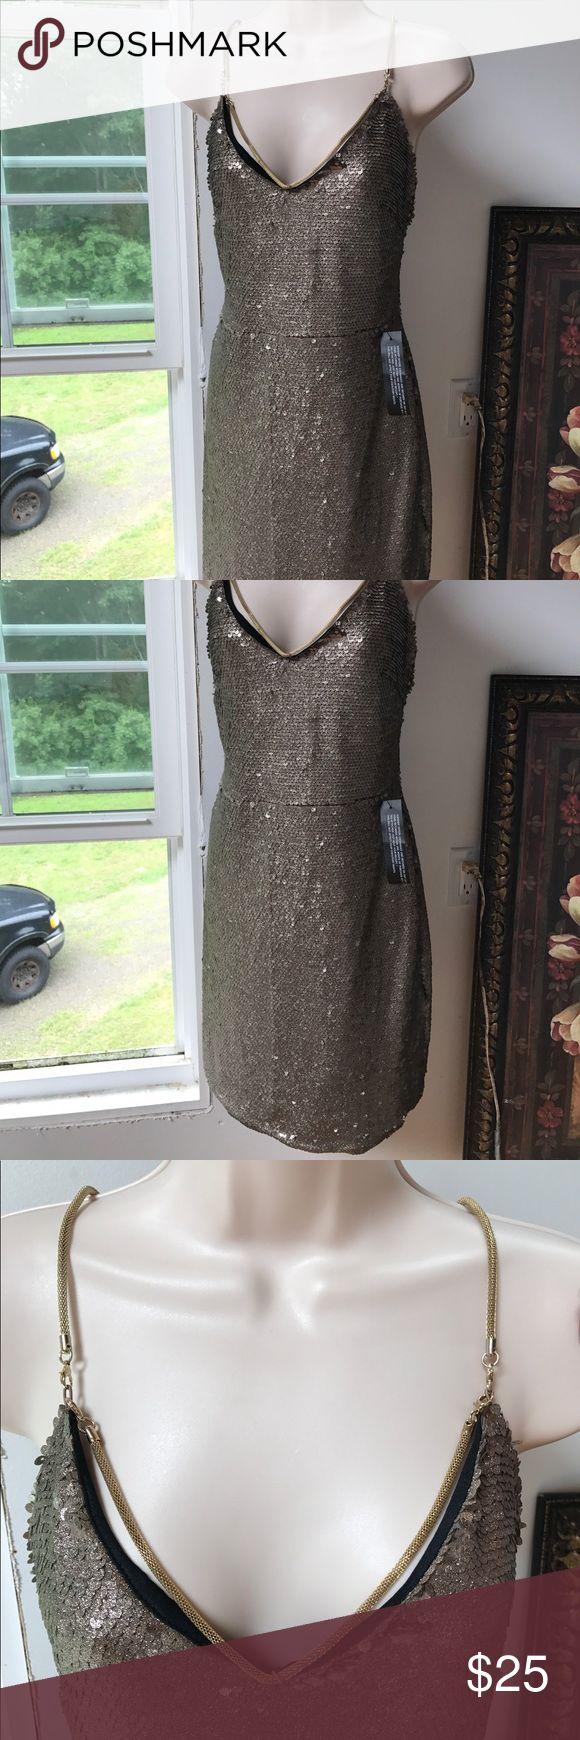 TopShop size 12 Bronze Sequence Dress TopShop Size 12 Sequence dress. Bronze colored. NWT Topshop Dresses Mini